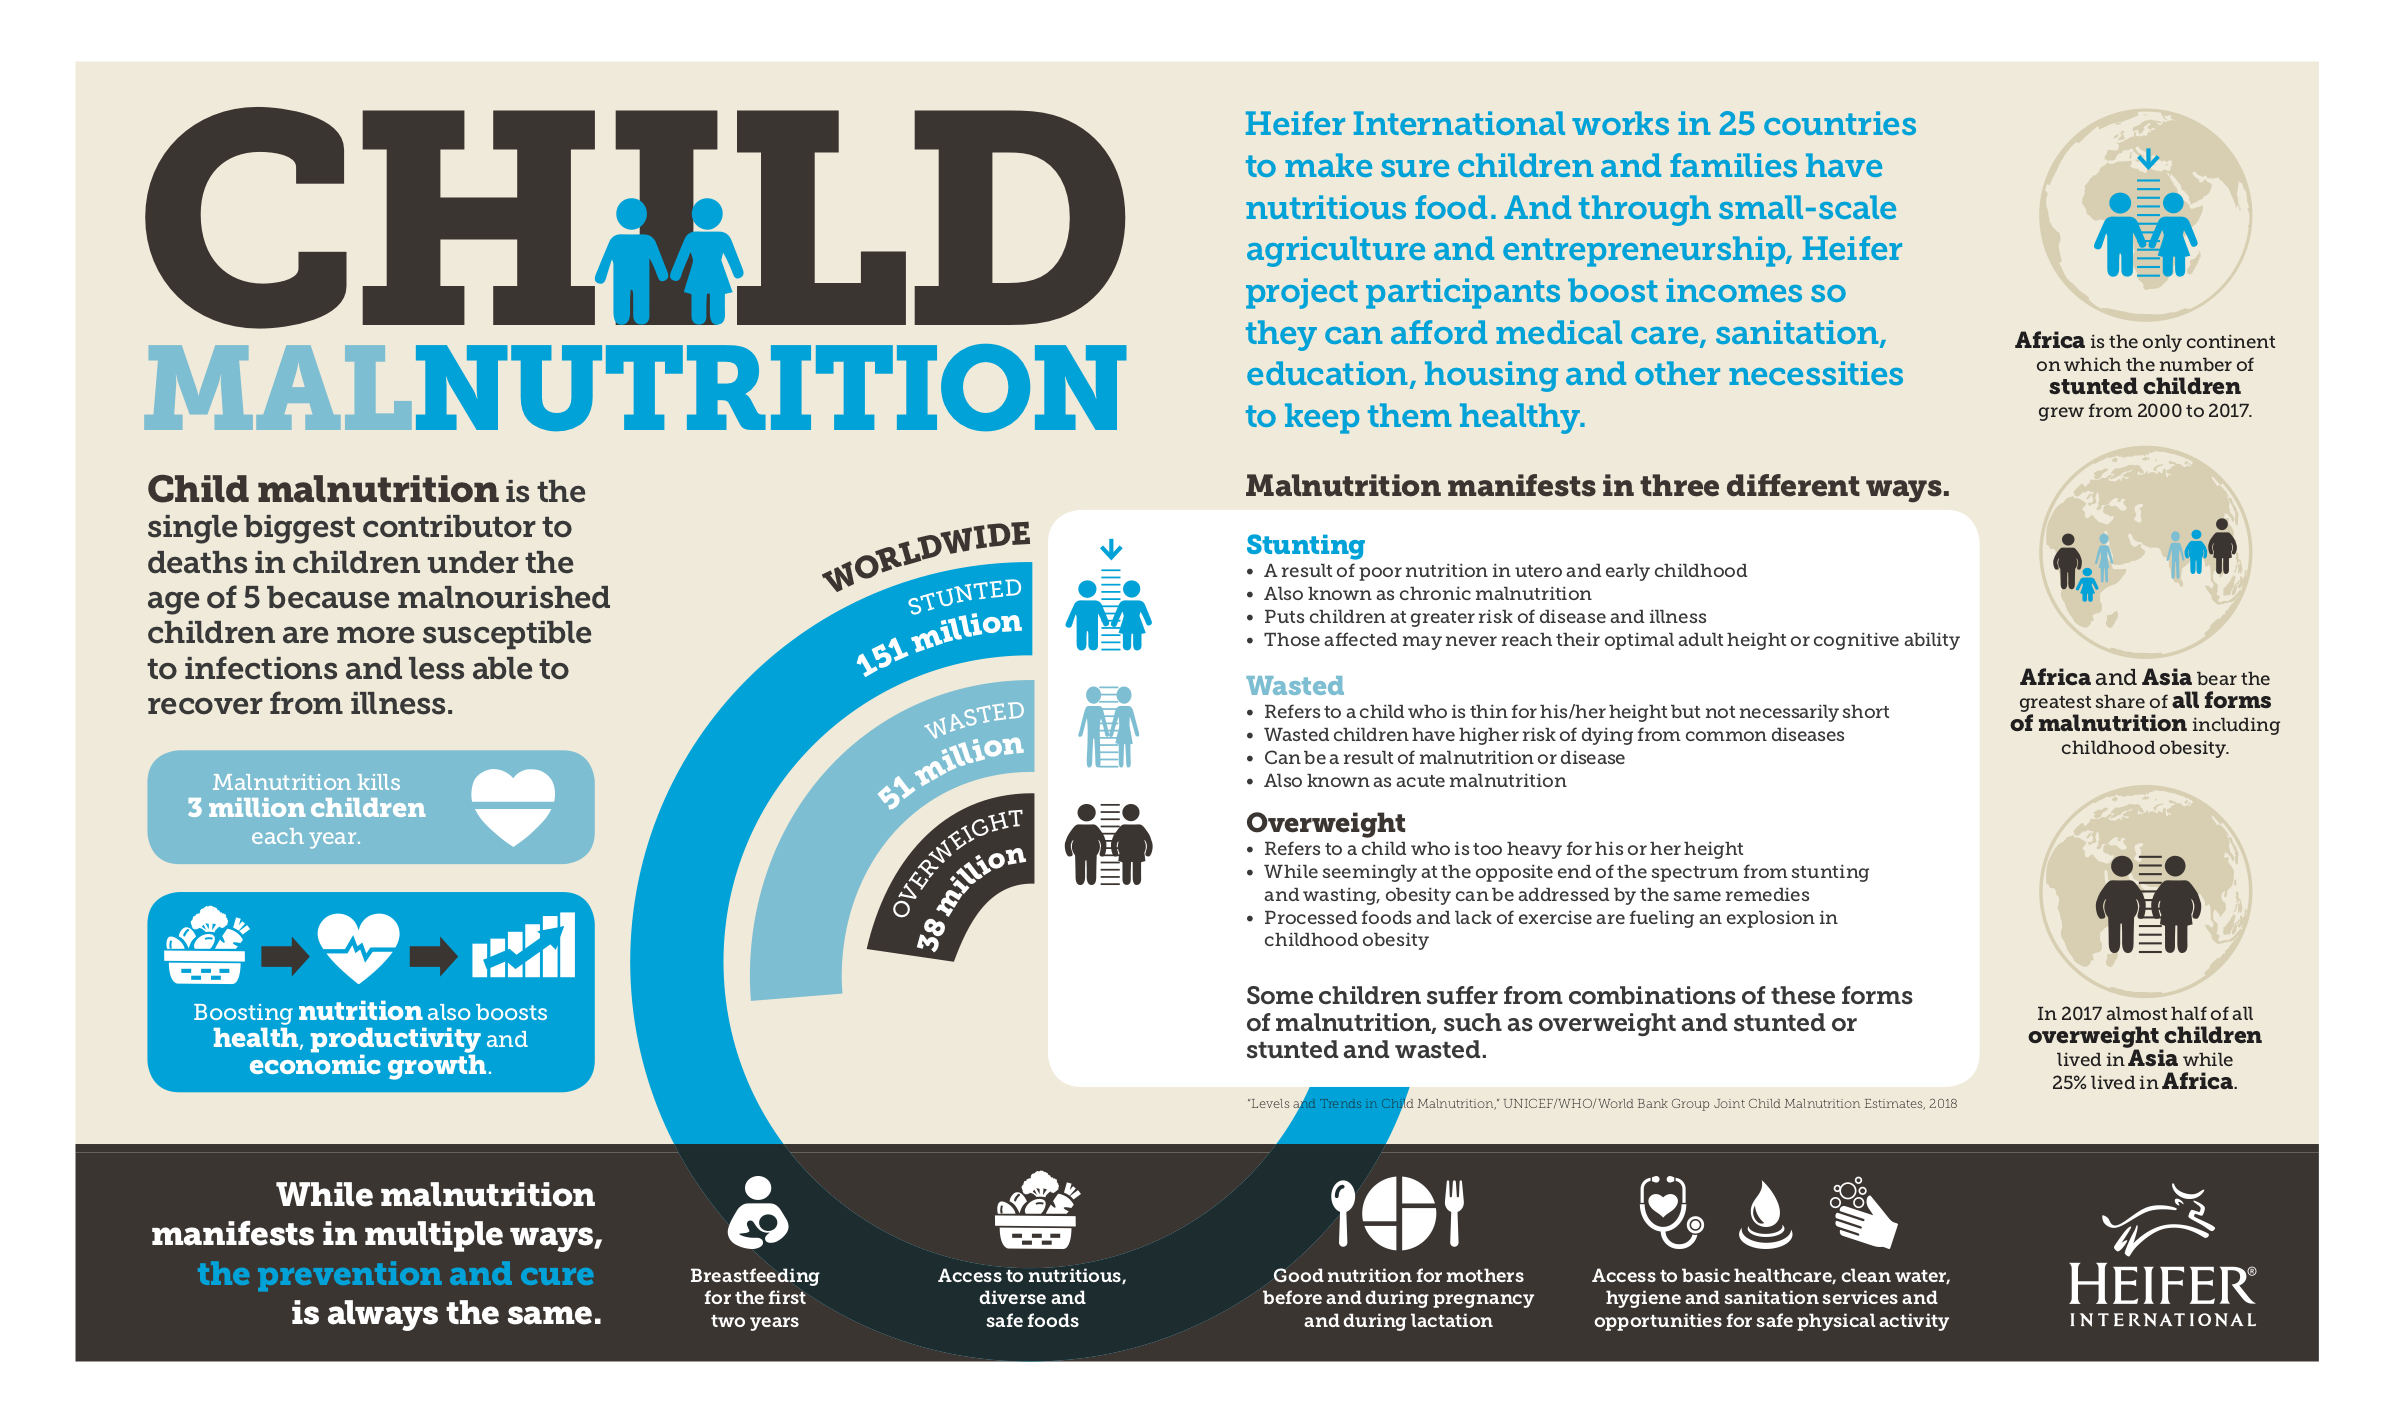 Statistics on childhood malnutrition